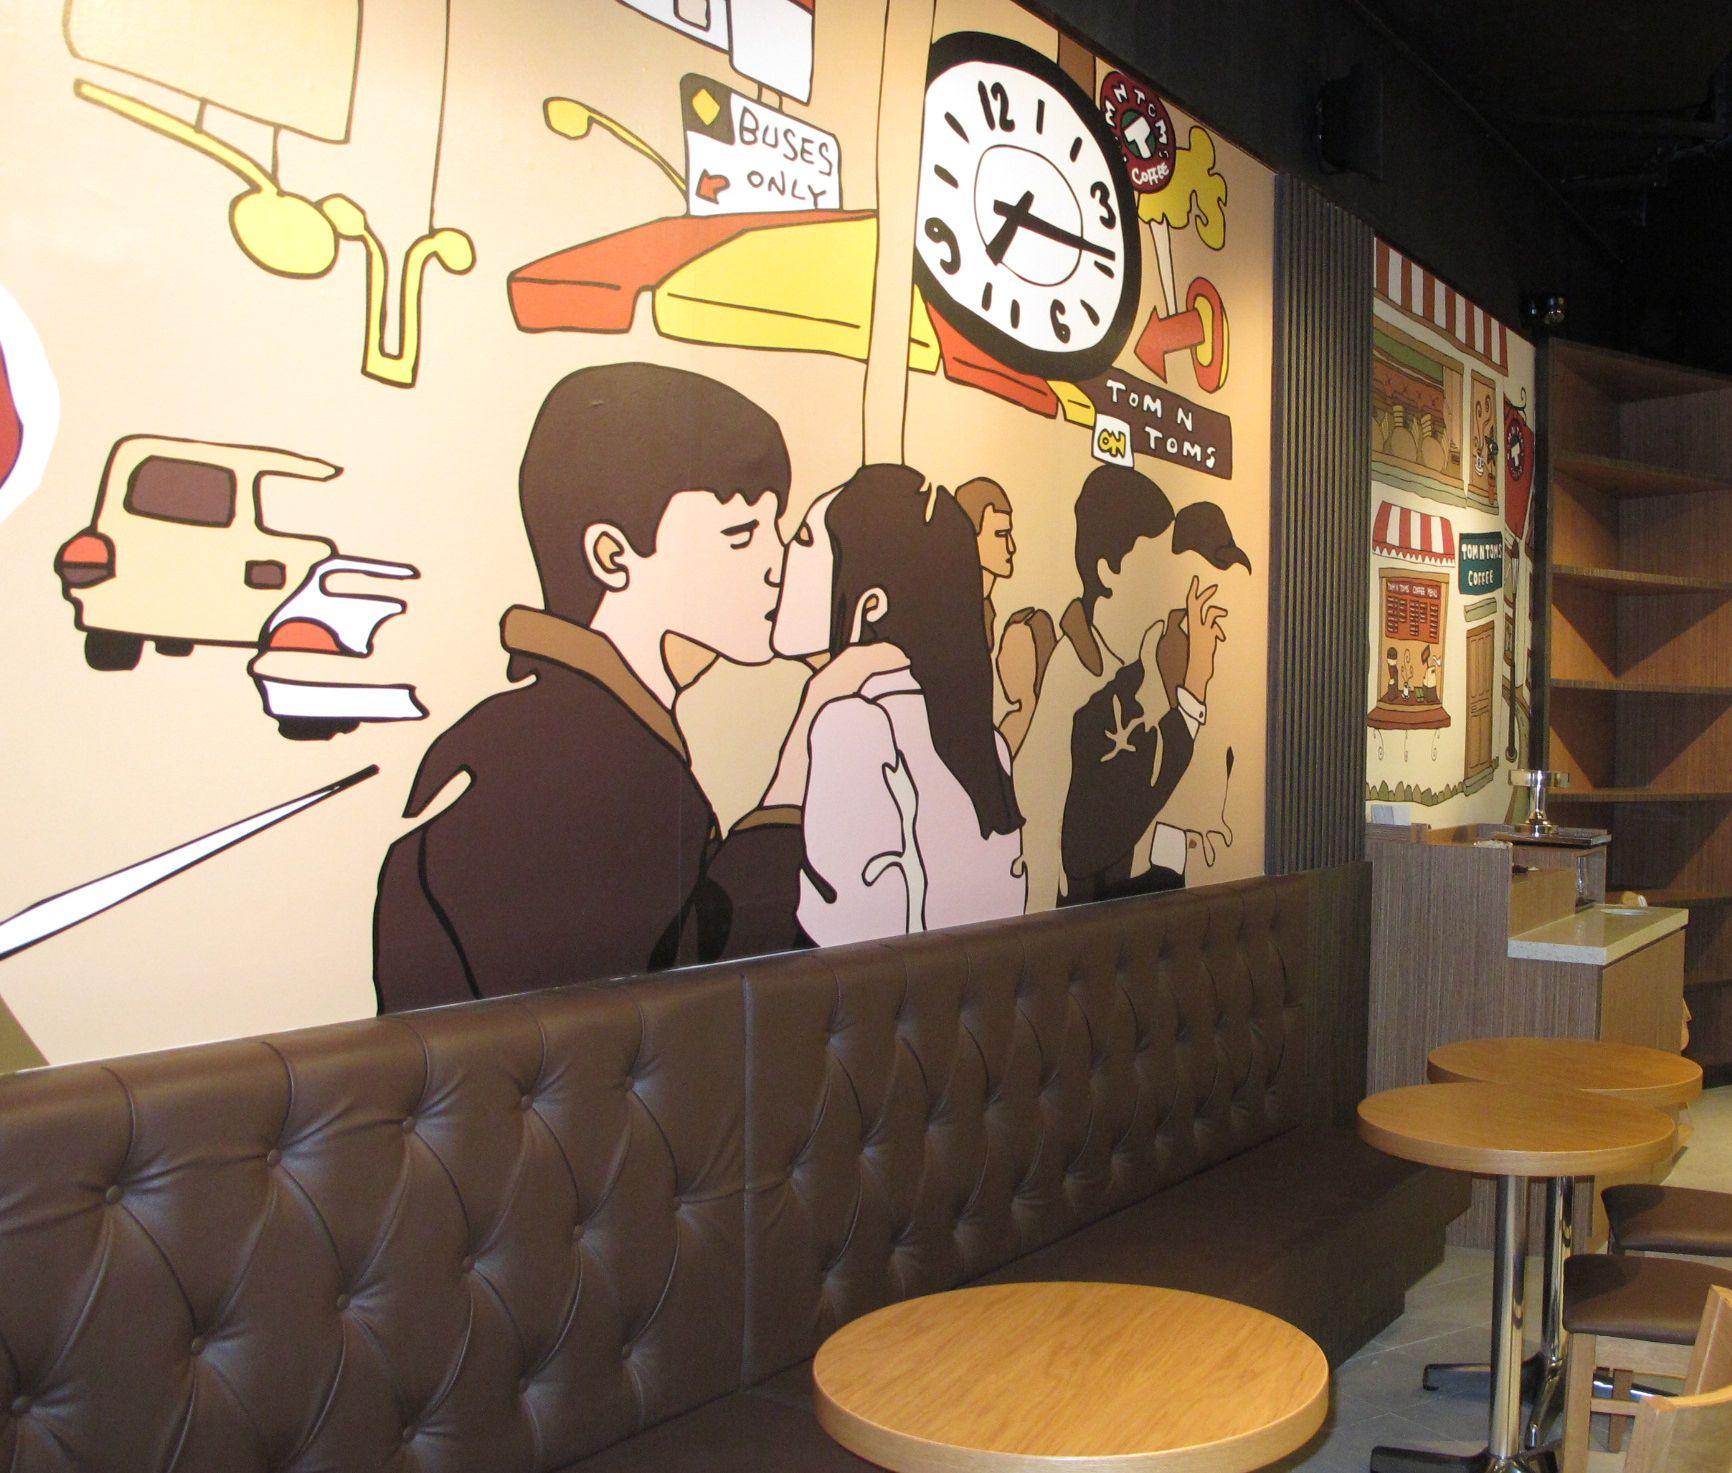 coffee bar mural design inside tom n toms, south korean leading